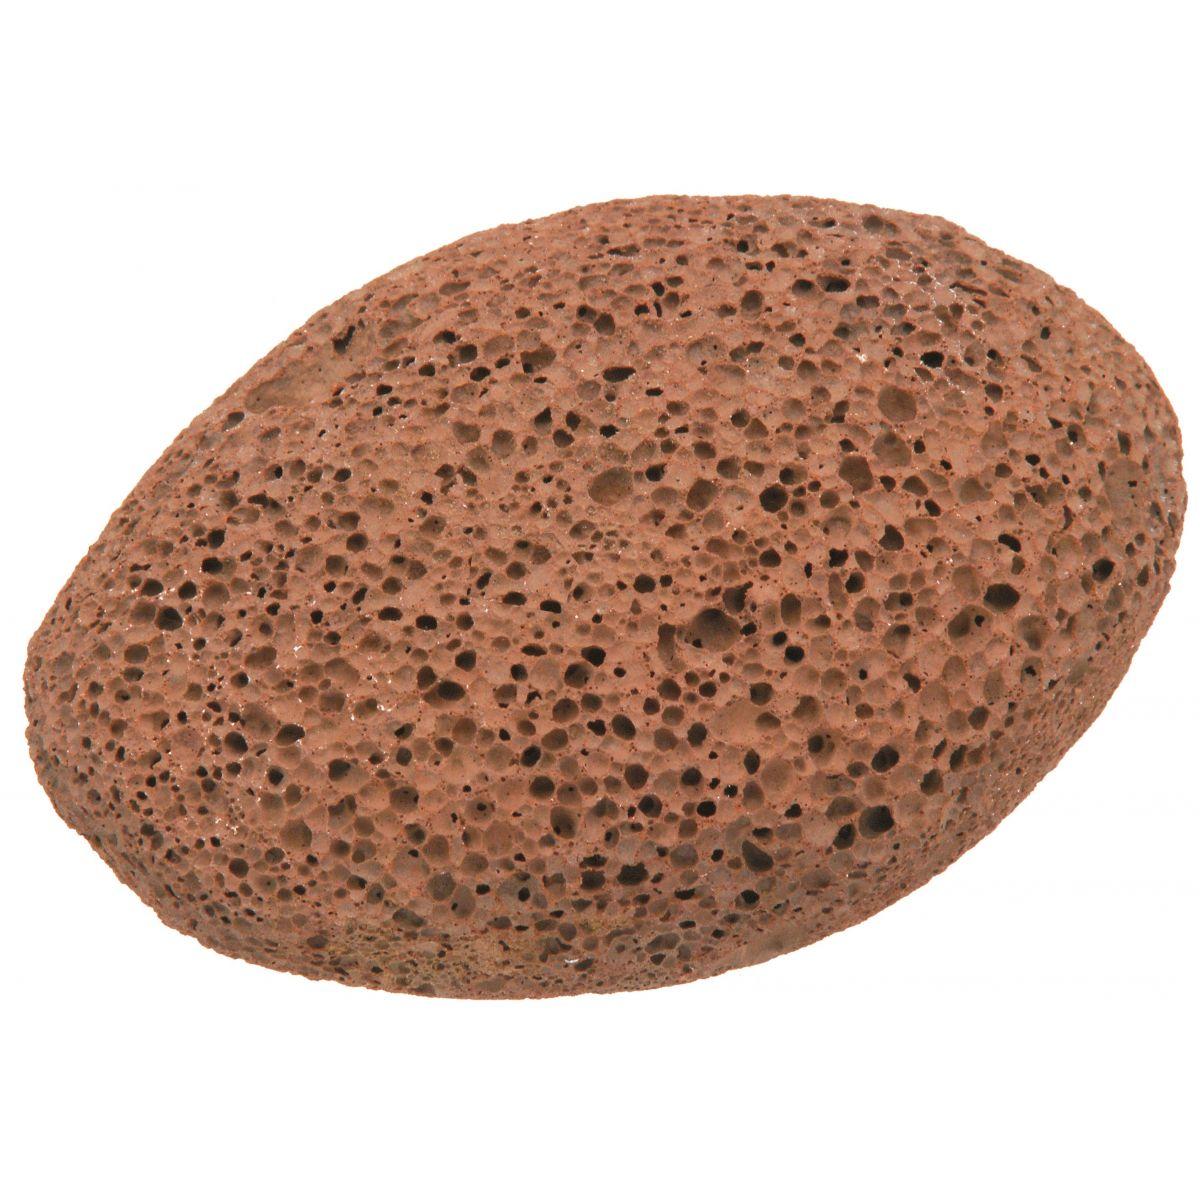 Pedra Pomes Natural Vulcânica – Santa Clara